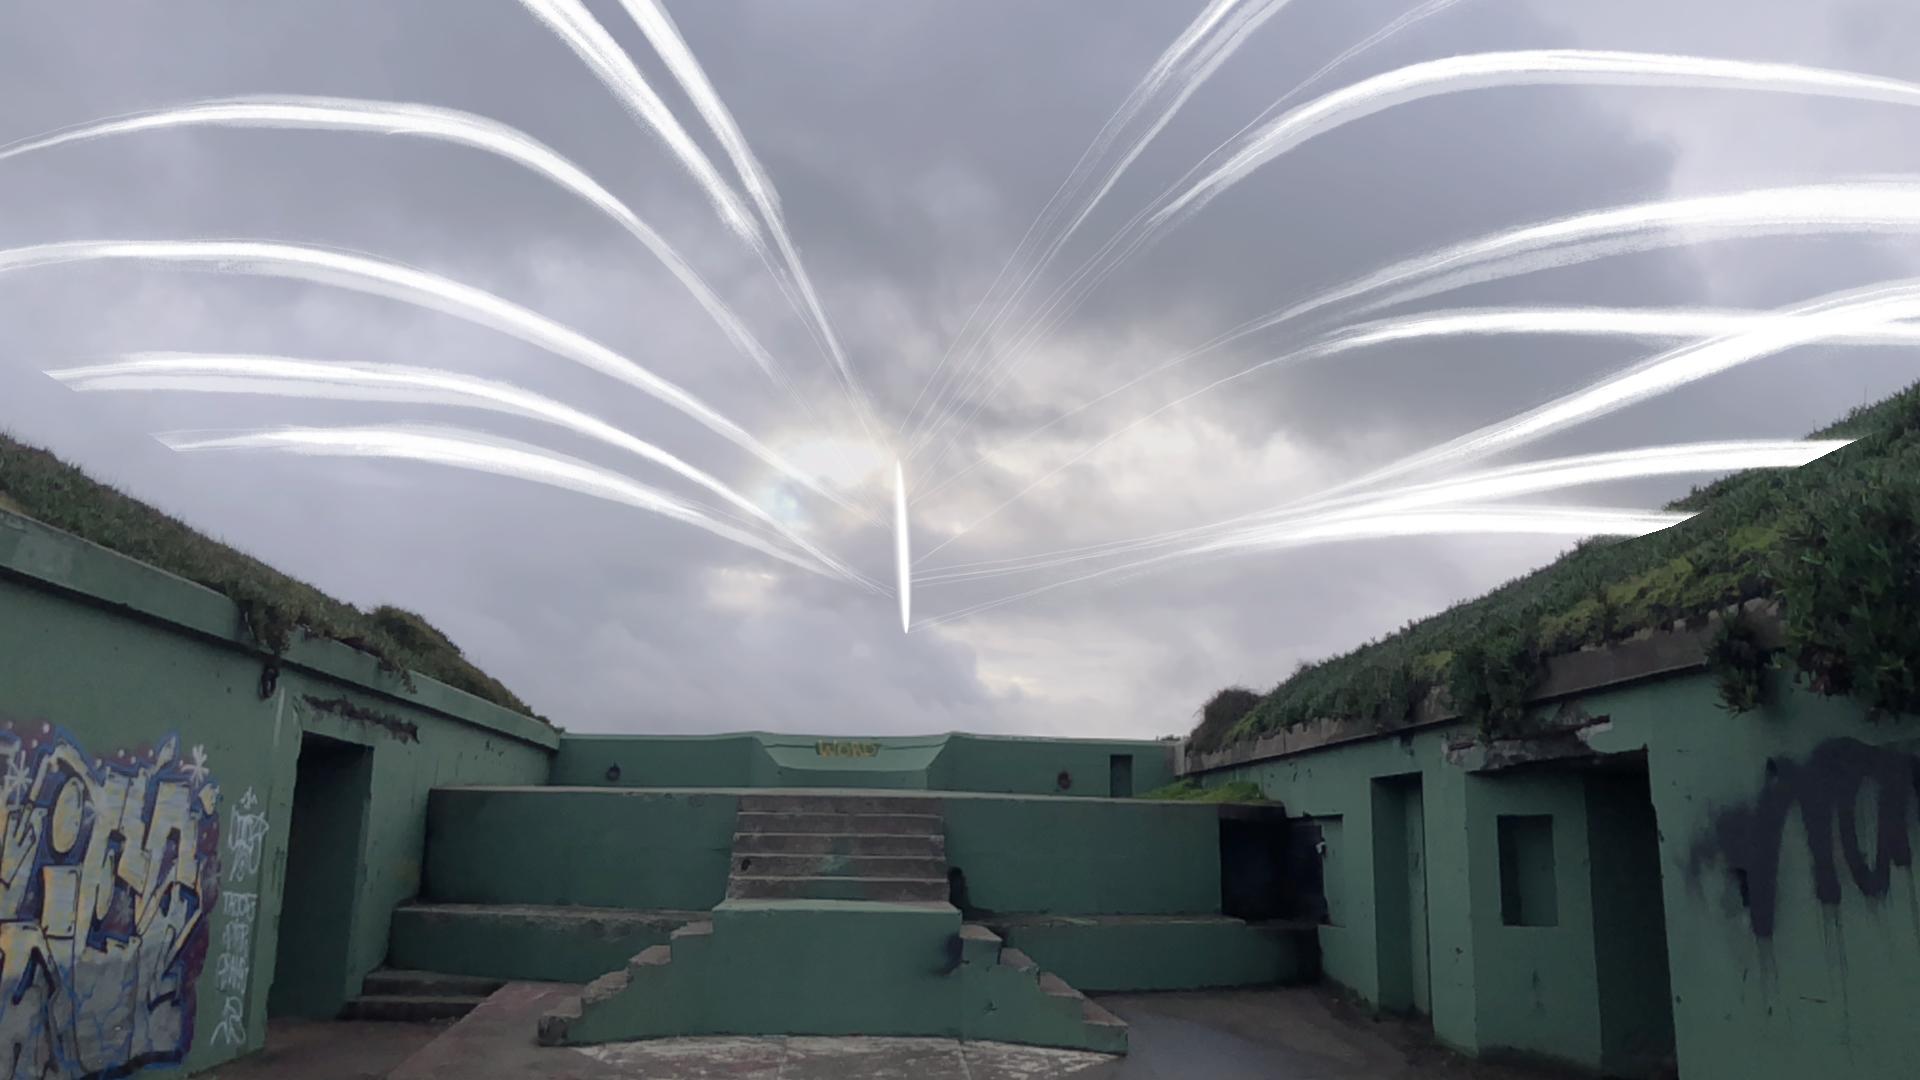 Vishal K. Dar, 'Edge of See: Twilight Engines' (app view), 2019.